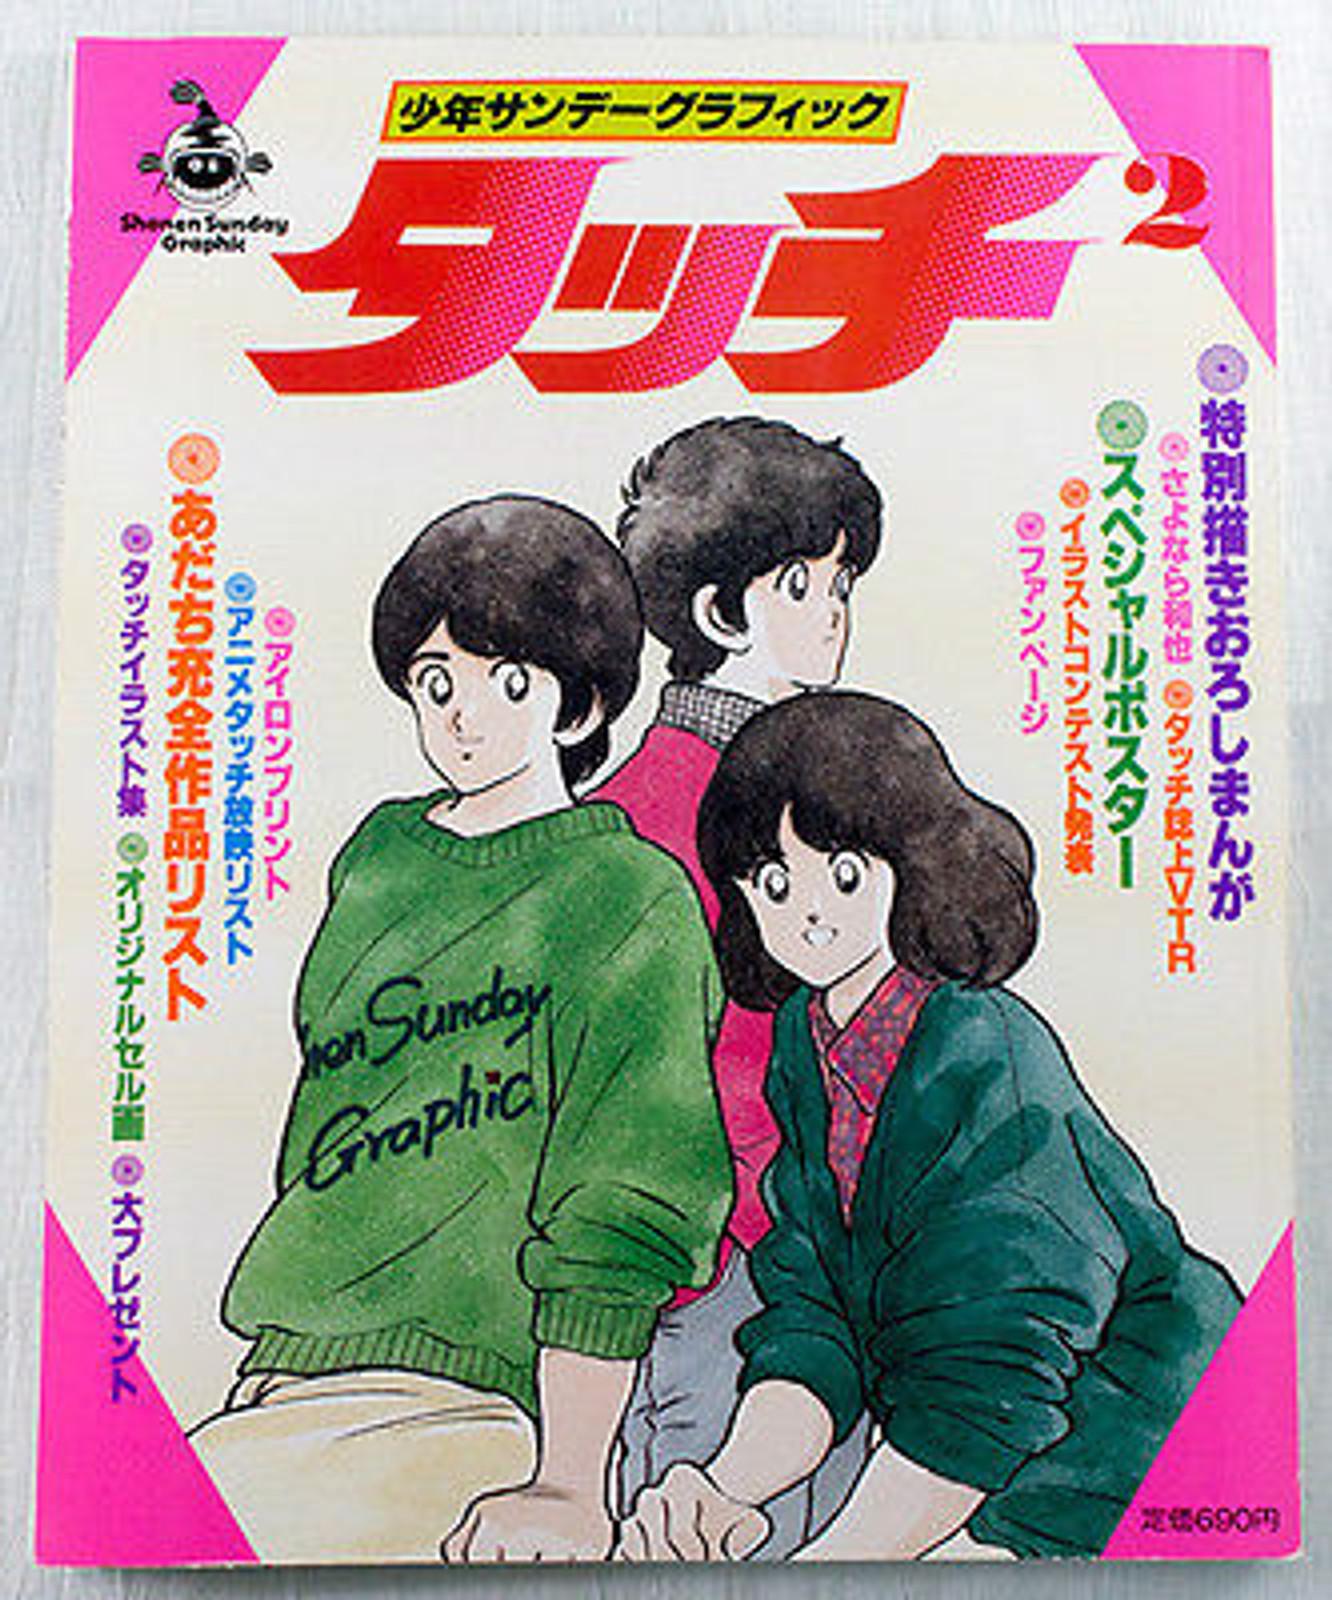 TOUCH Sunday Graphic2 Book Shonen mitsuru adachi sticker poster JAPAN ANIME